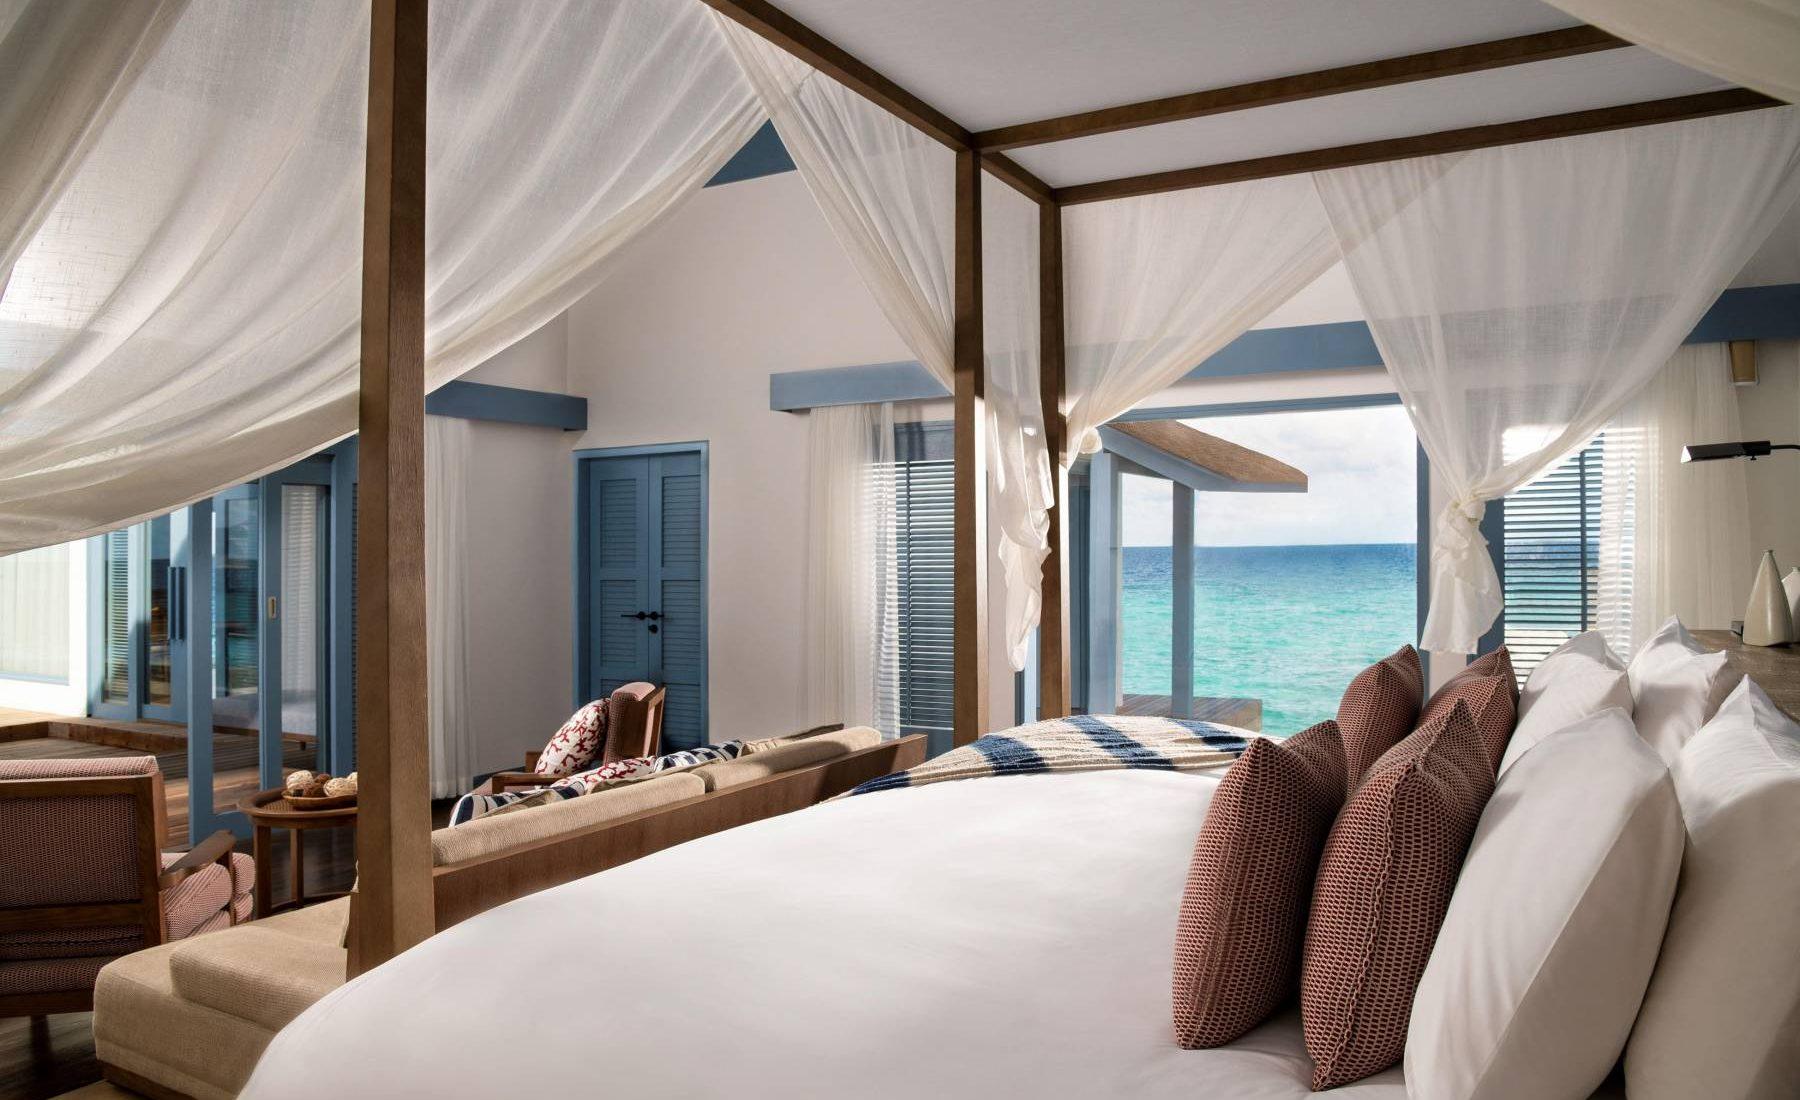 Raffles Maldives Meradhoo - Overwater Villa with Pool